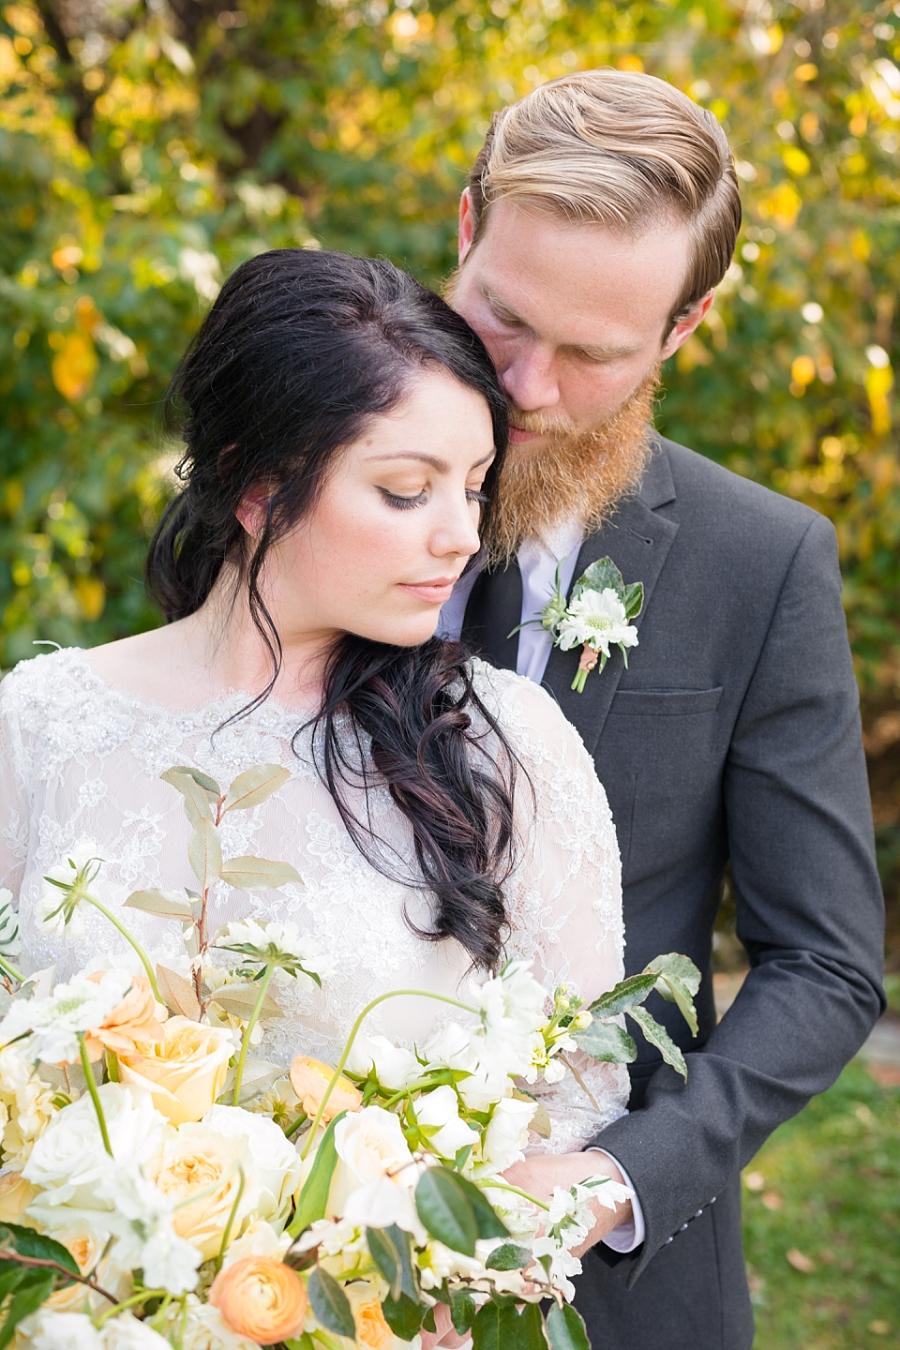 Stacy-Anderson-Photography-Nashville-Houston-Destination-Wedding-Photographer_0008-2.jpg